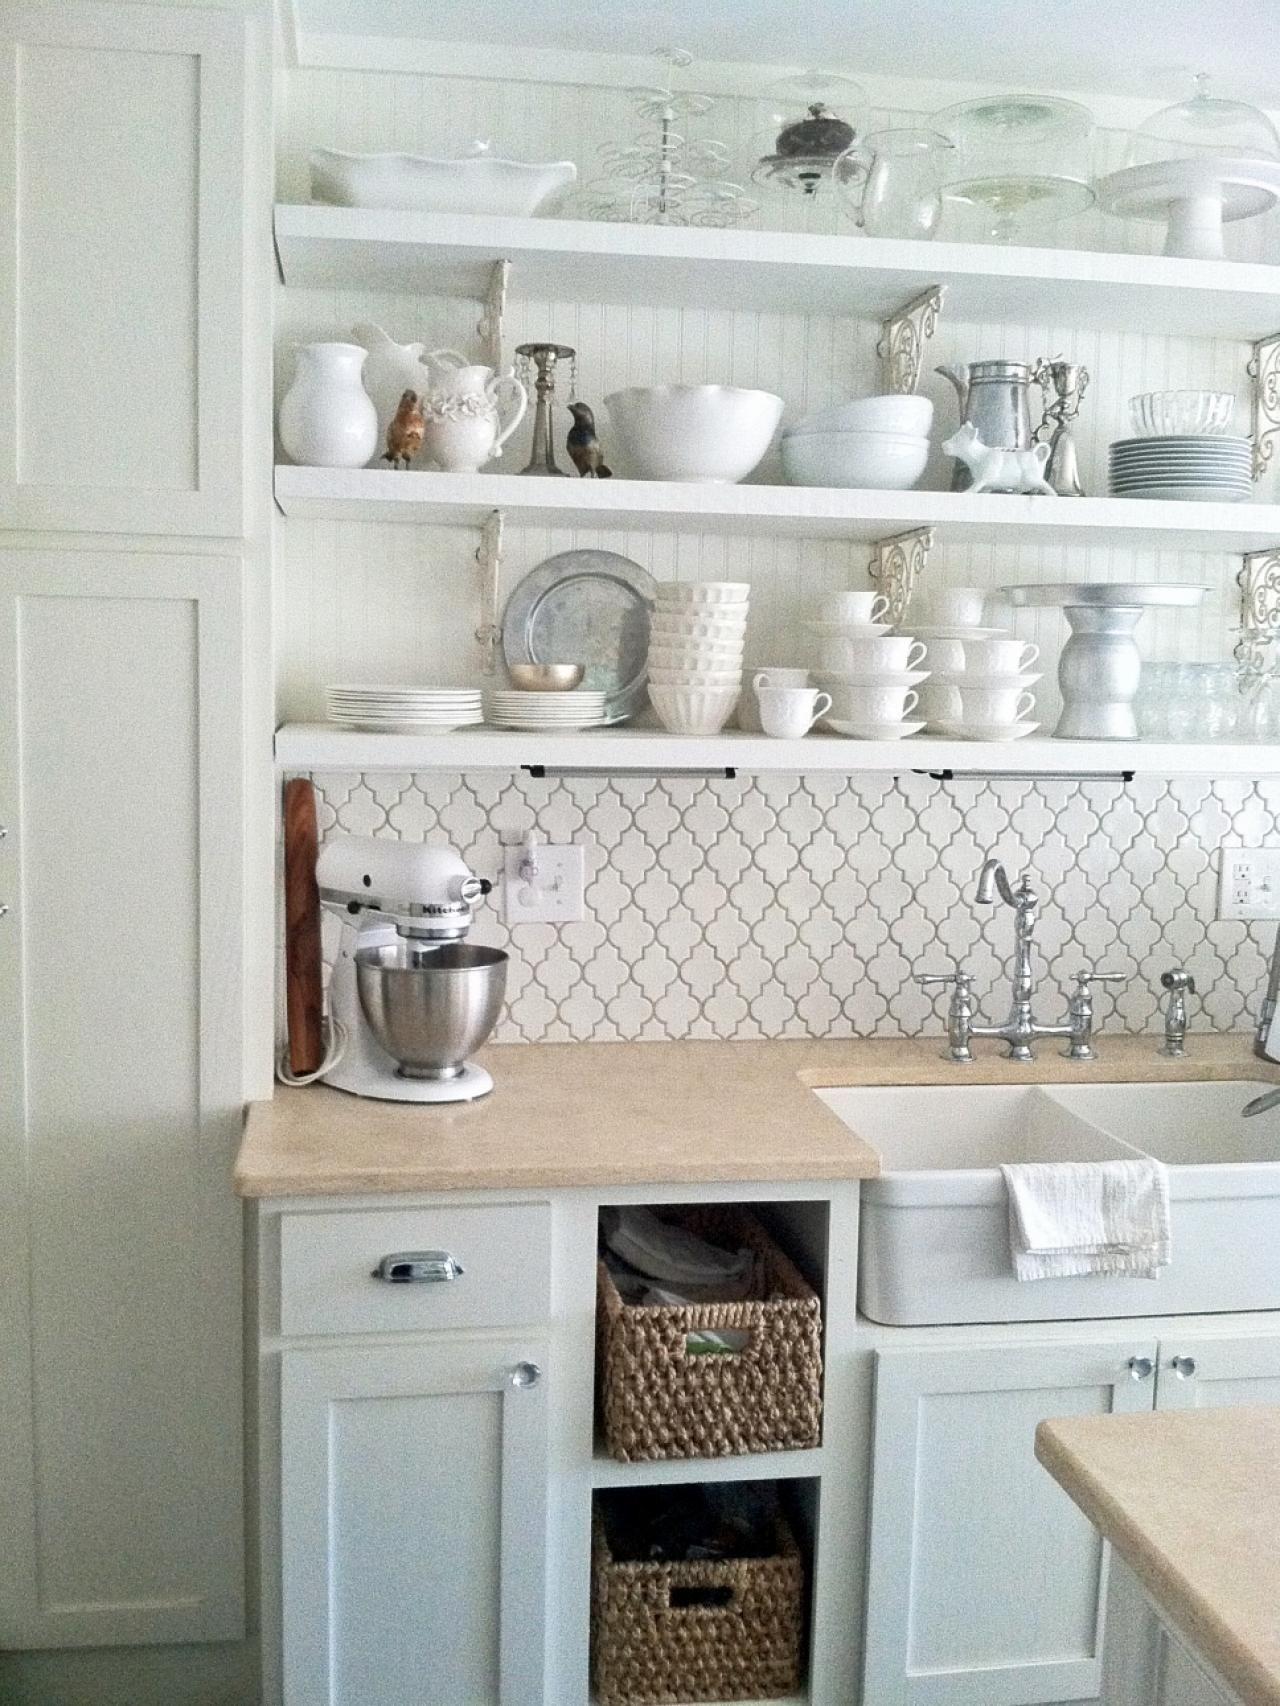 Pictures Of Kitchen Backsplash Ideas From Hgtv Cottage Style Kitchen Farmhouse Kitchen Backsplash Cottage Kitchens